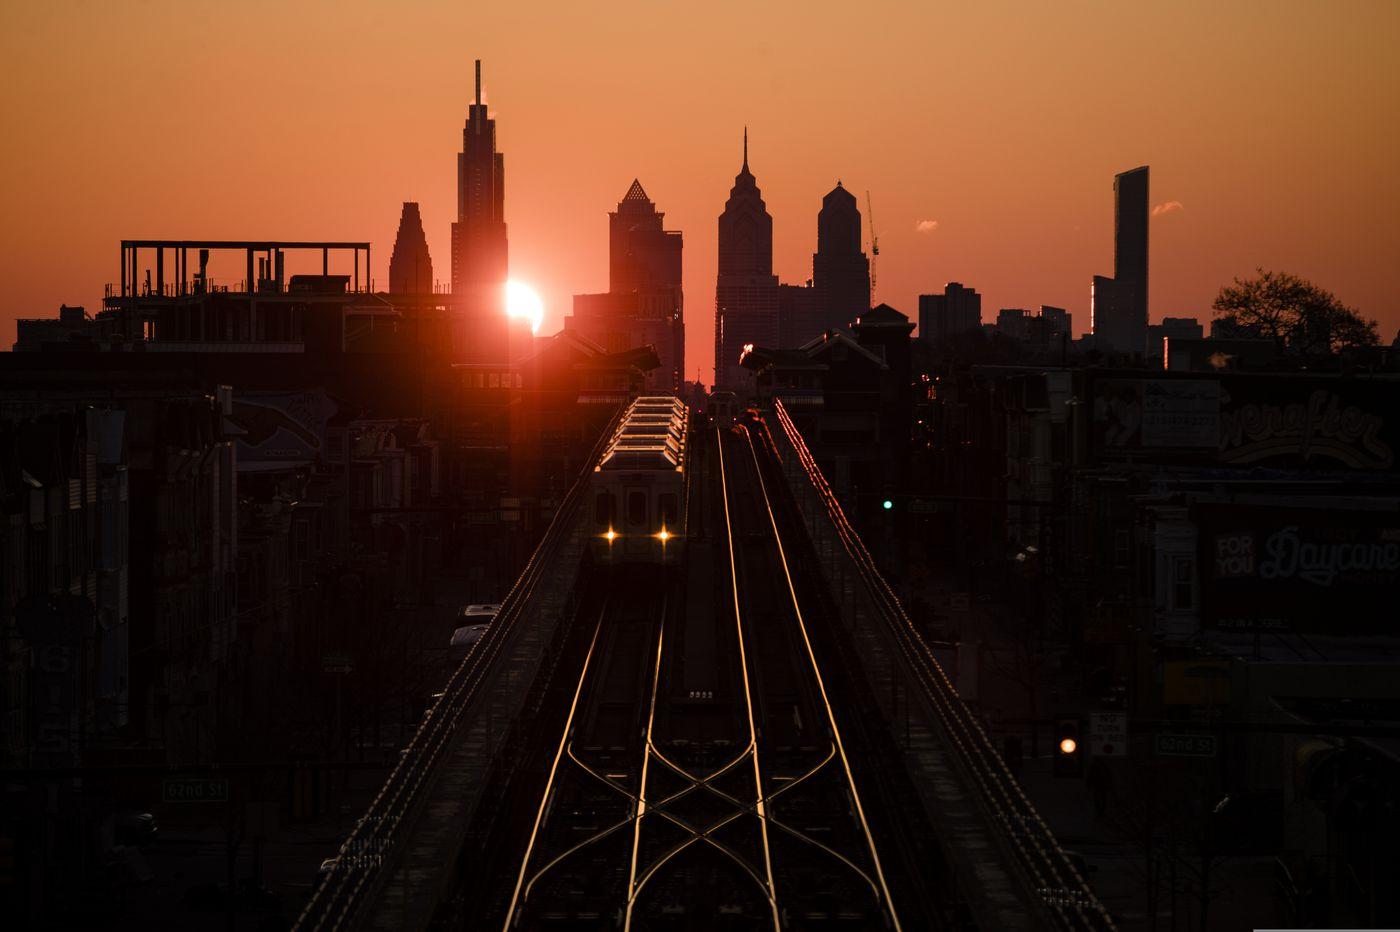 Philadelphia's next challenge: Stemming the tide of America's new urban crisis | Opinion